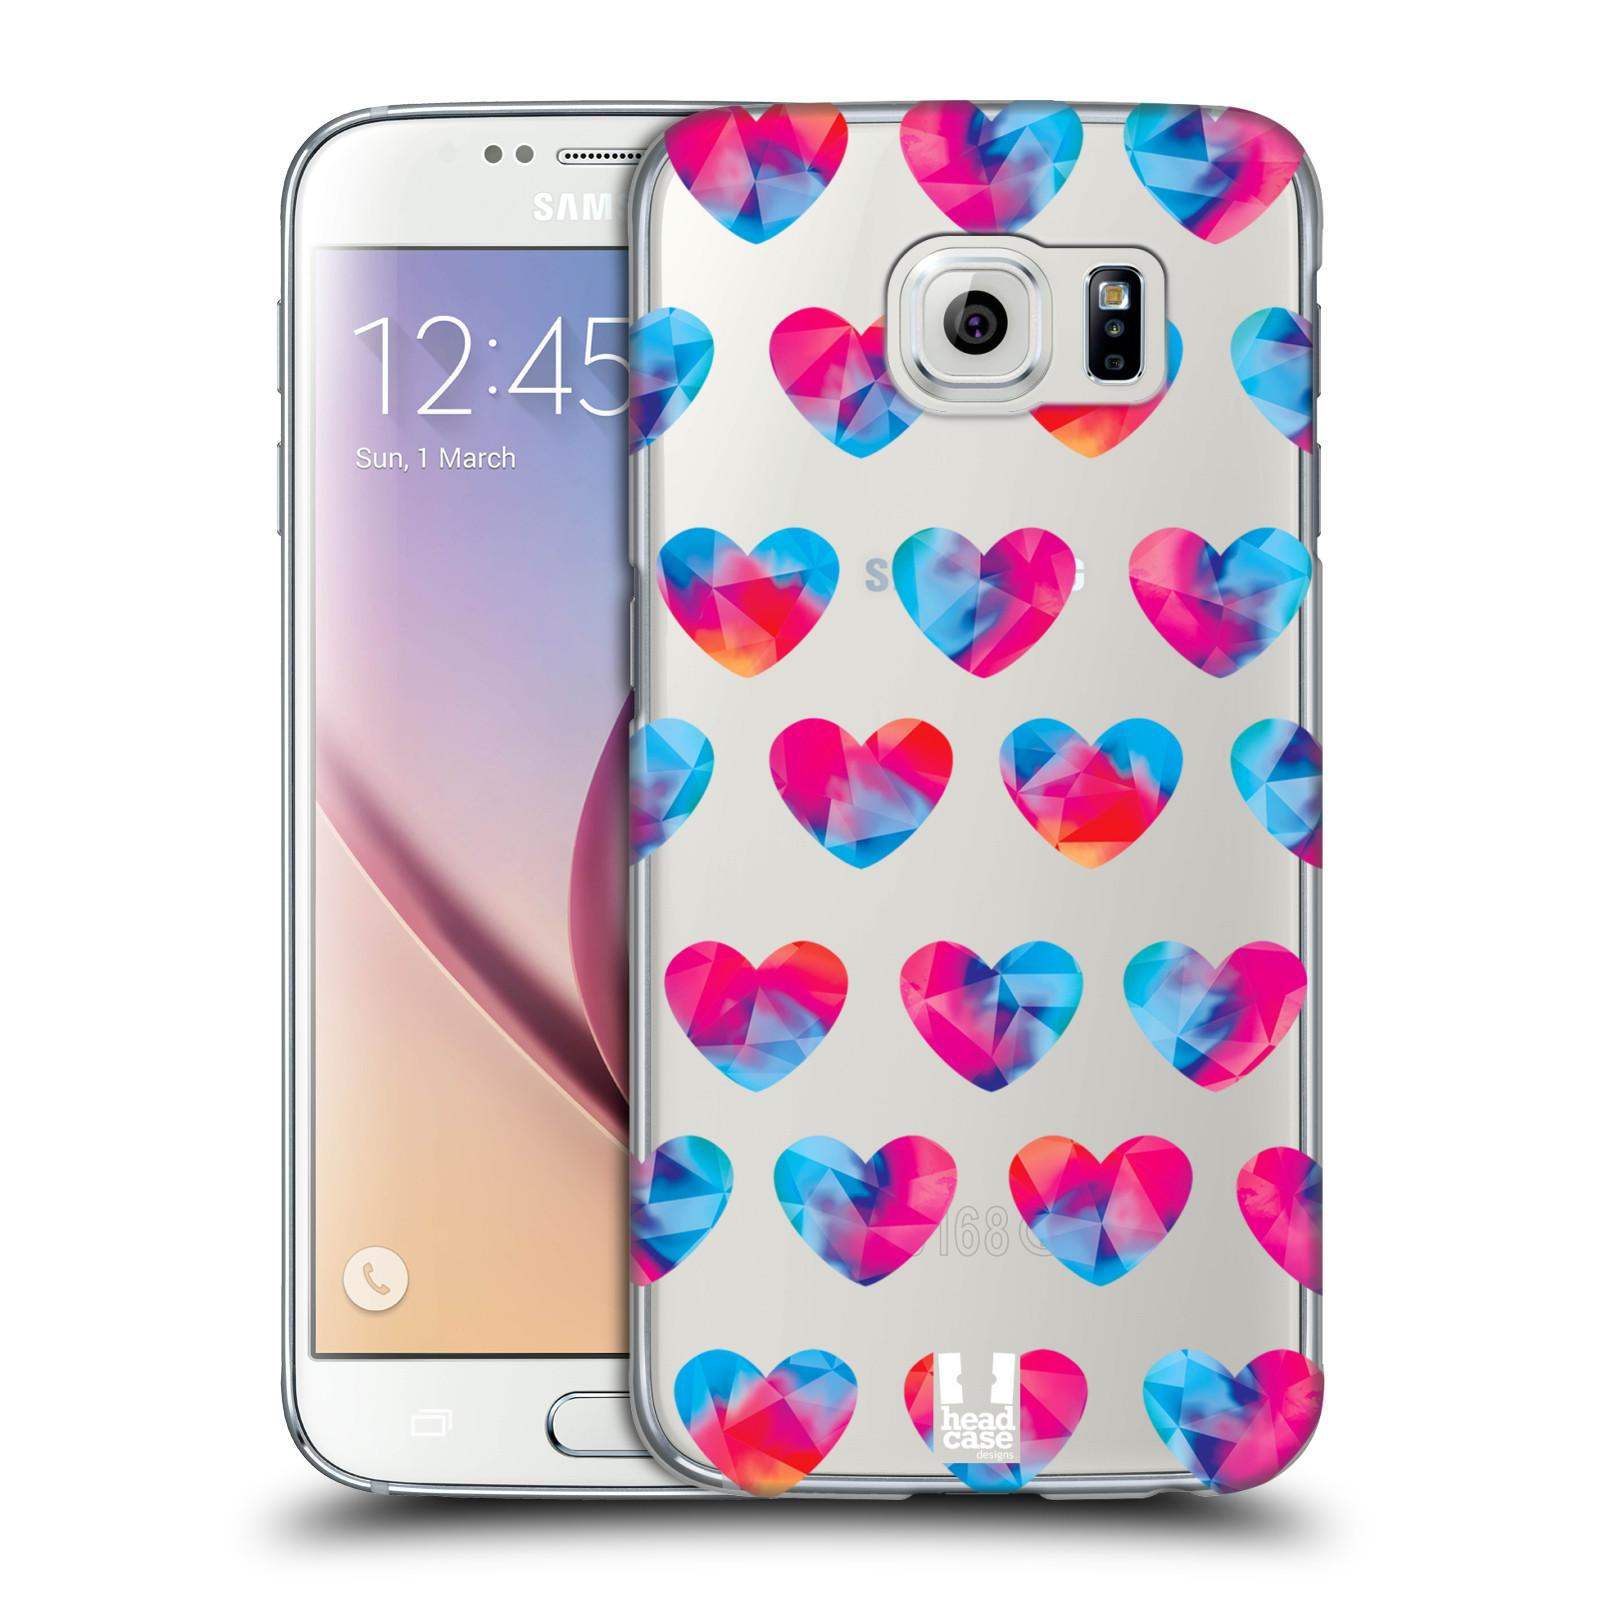 Plastové pouzdro na mobil Samsung Galaxy S6 - Head Case - Srdíčka hrající barvami